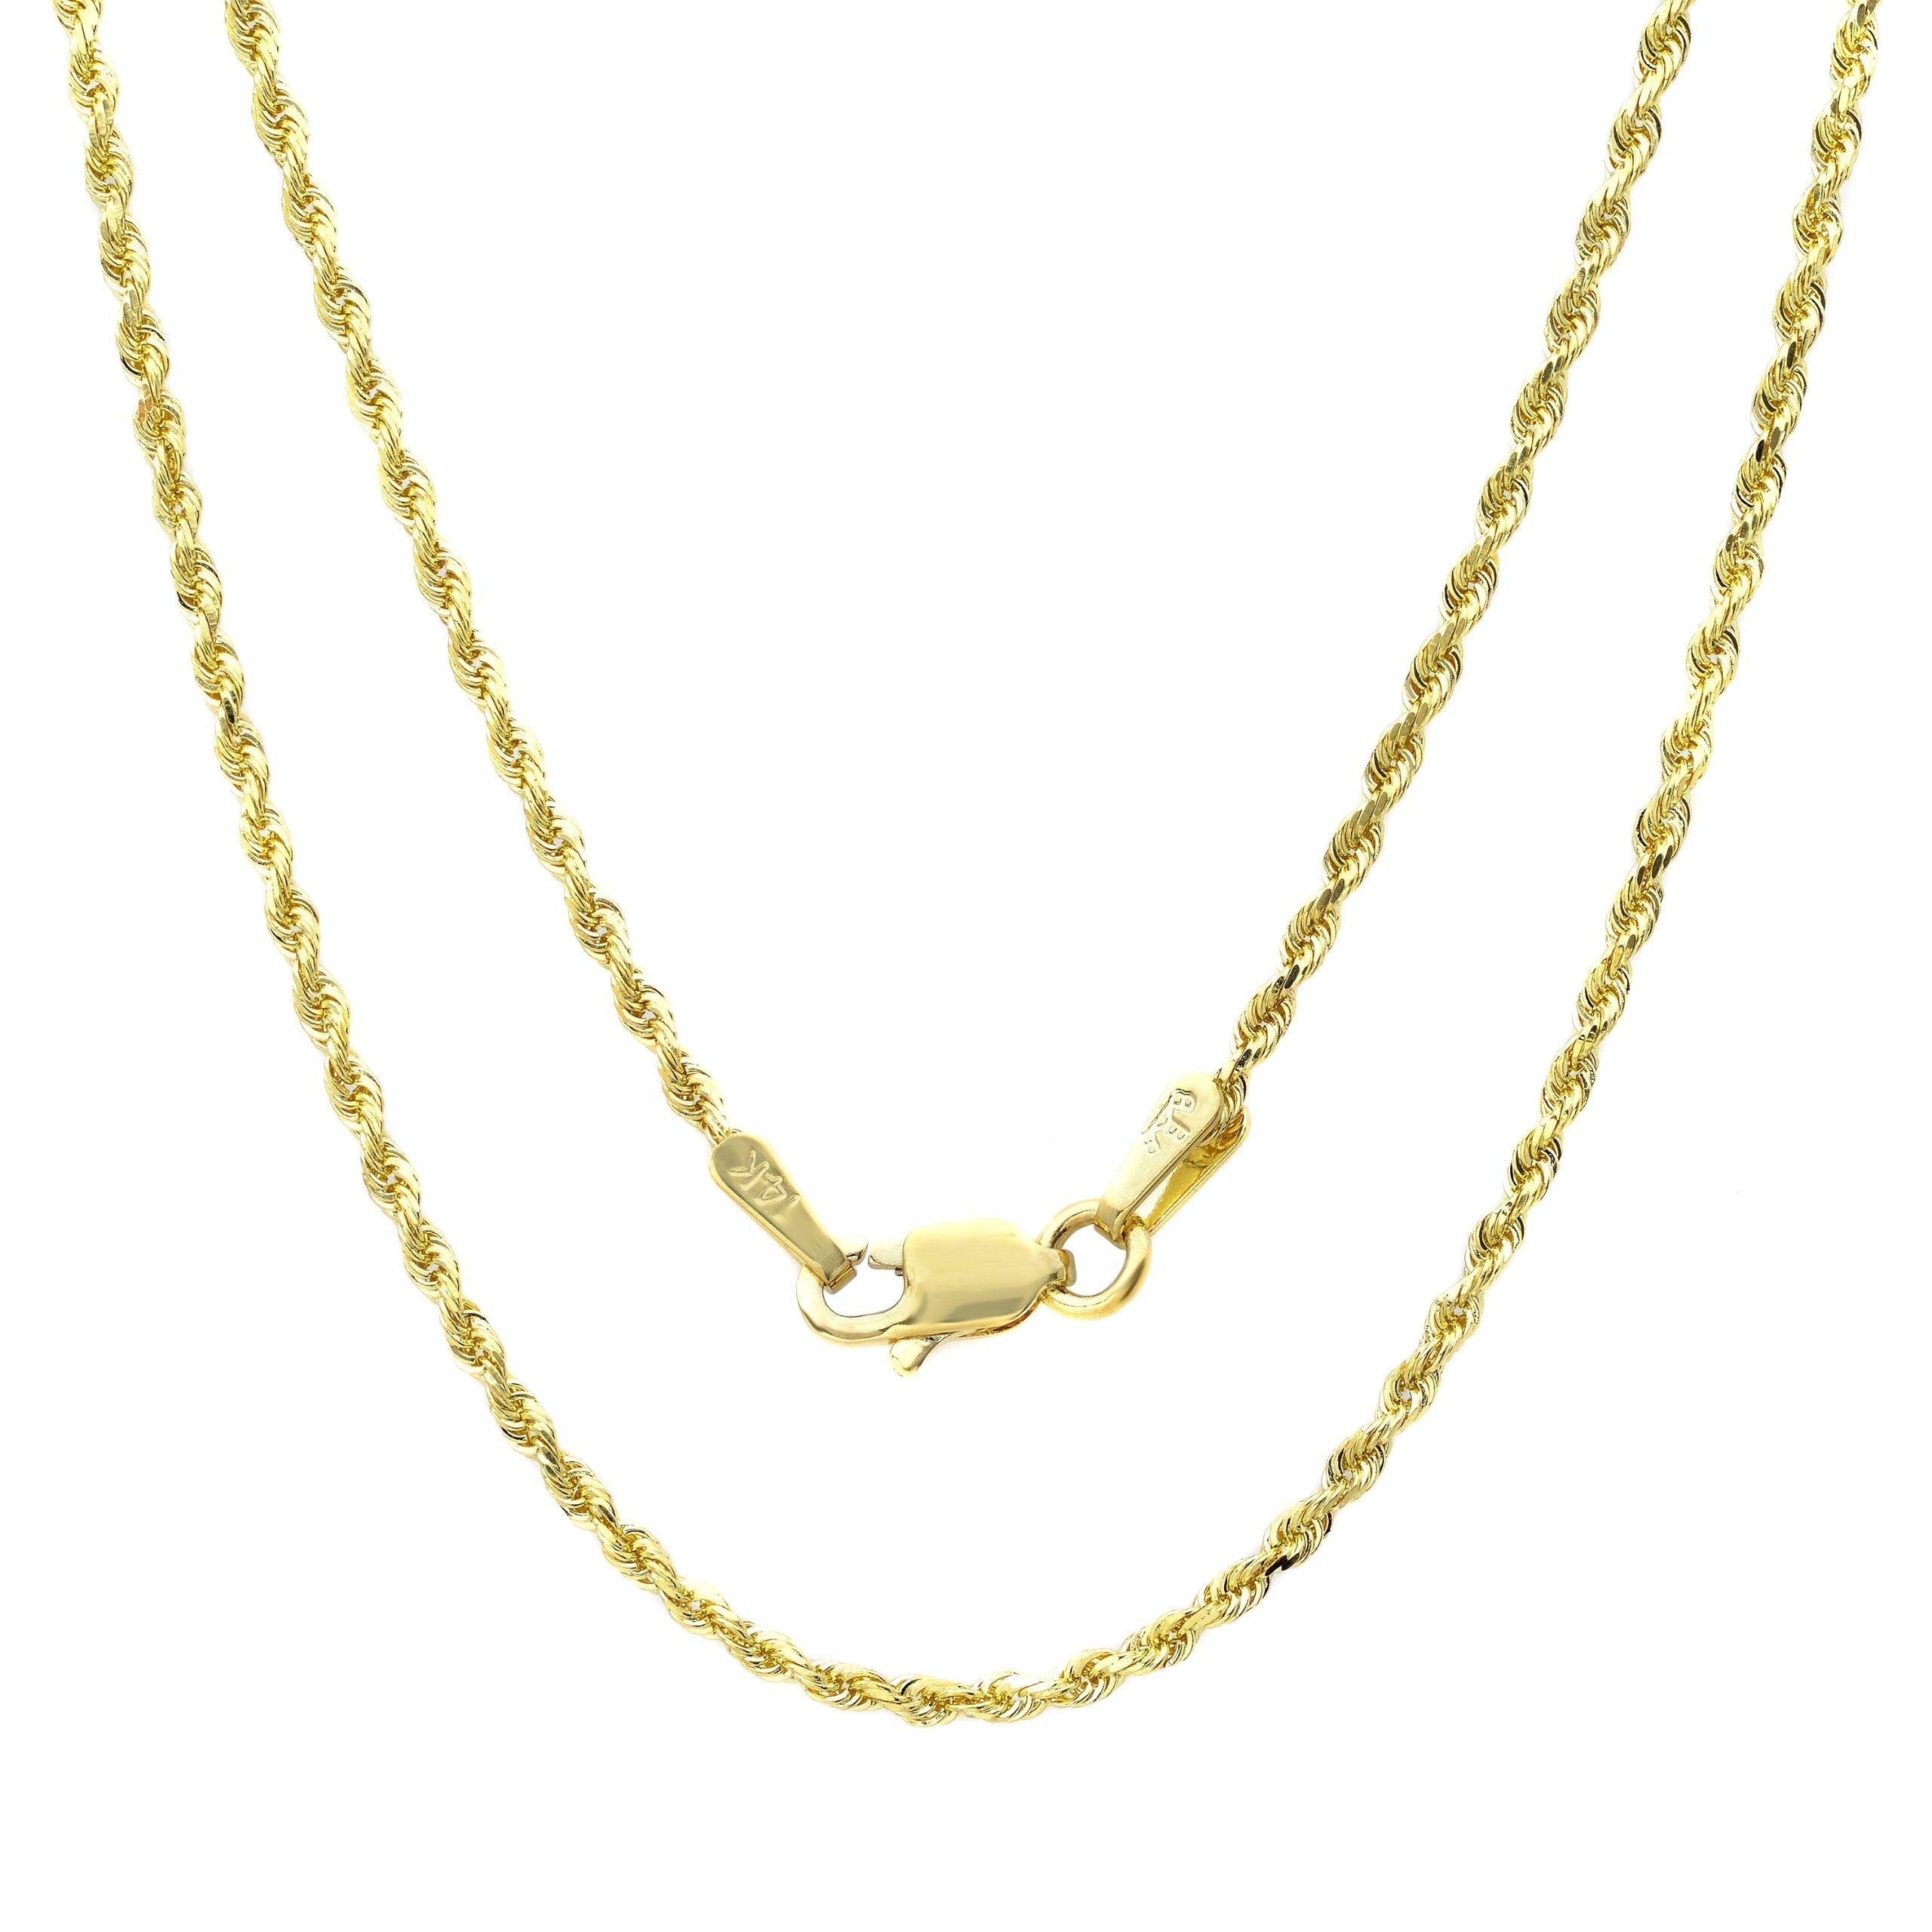 14k Yellow-gold 1.5 mm Diamond-cut Rope Chain, 16 Inch